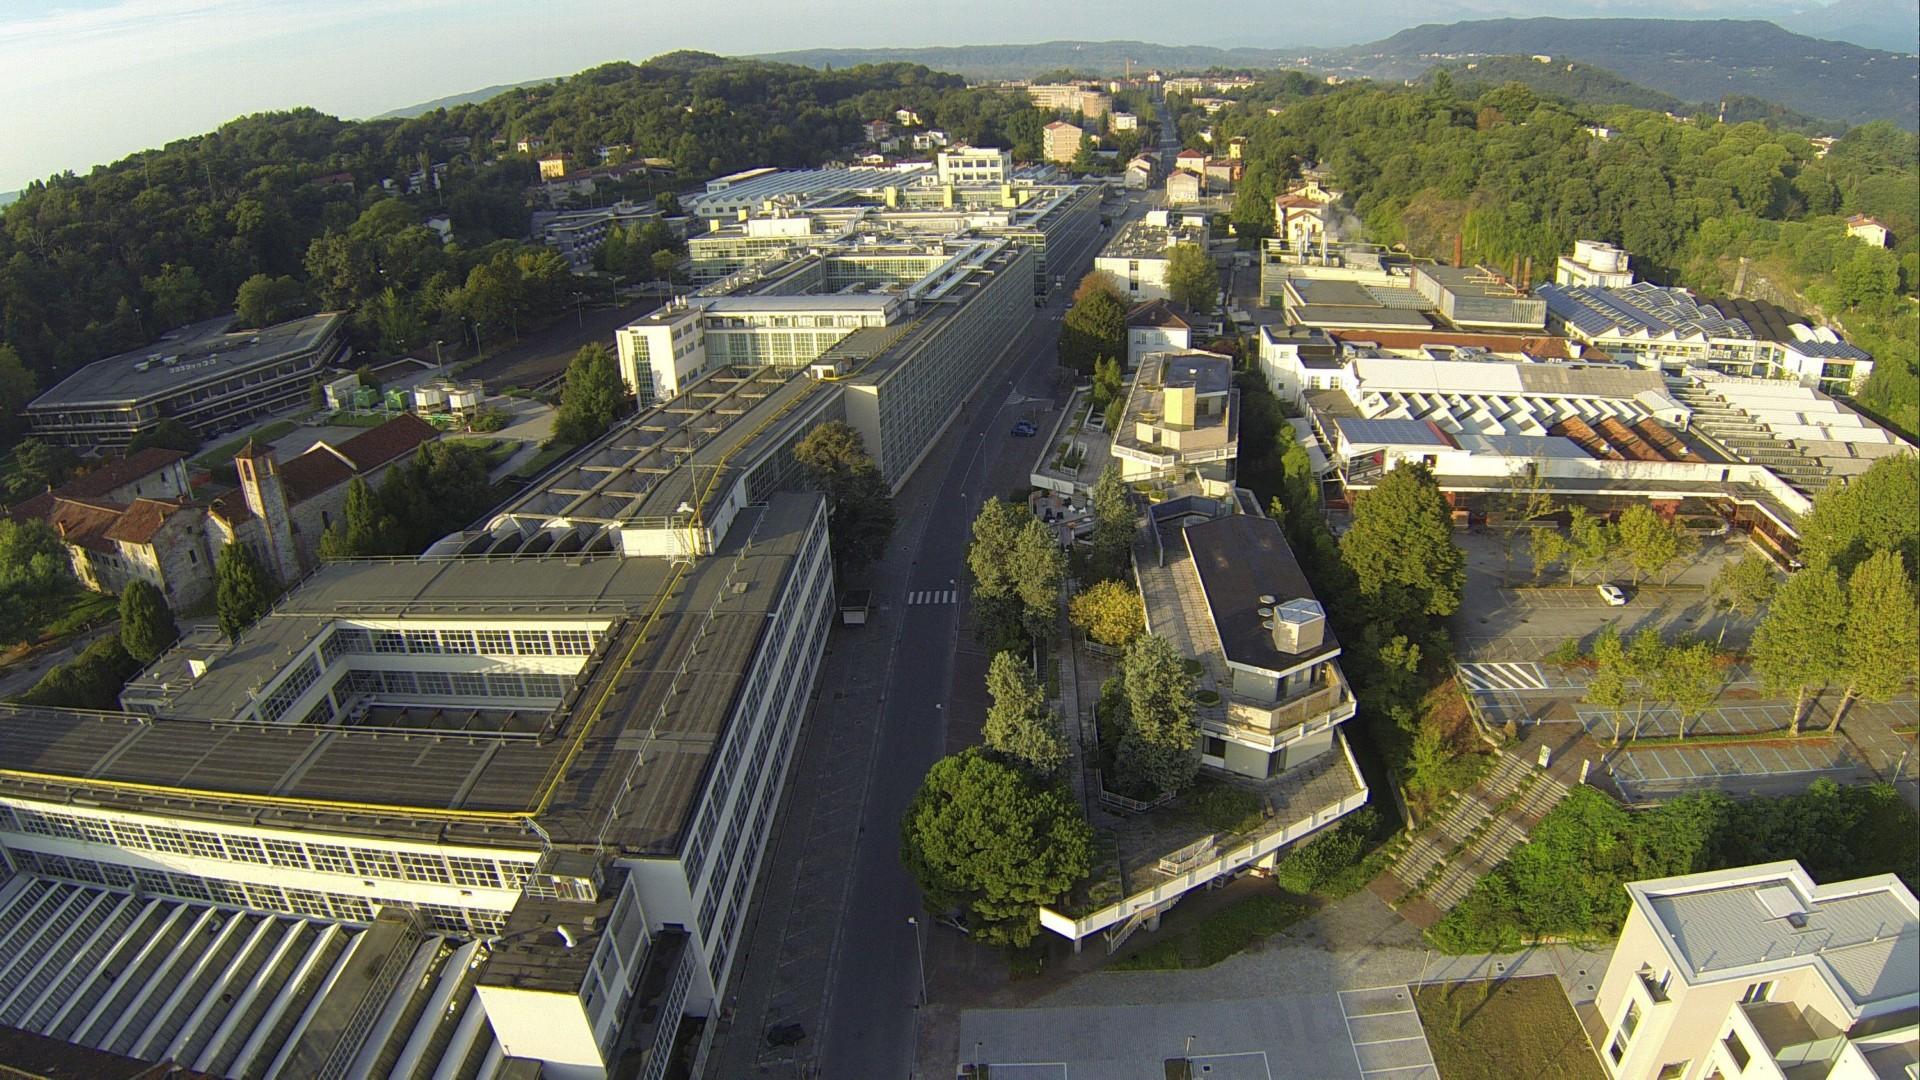 Ivrea as UNESCO World Heritage Site